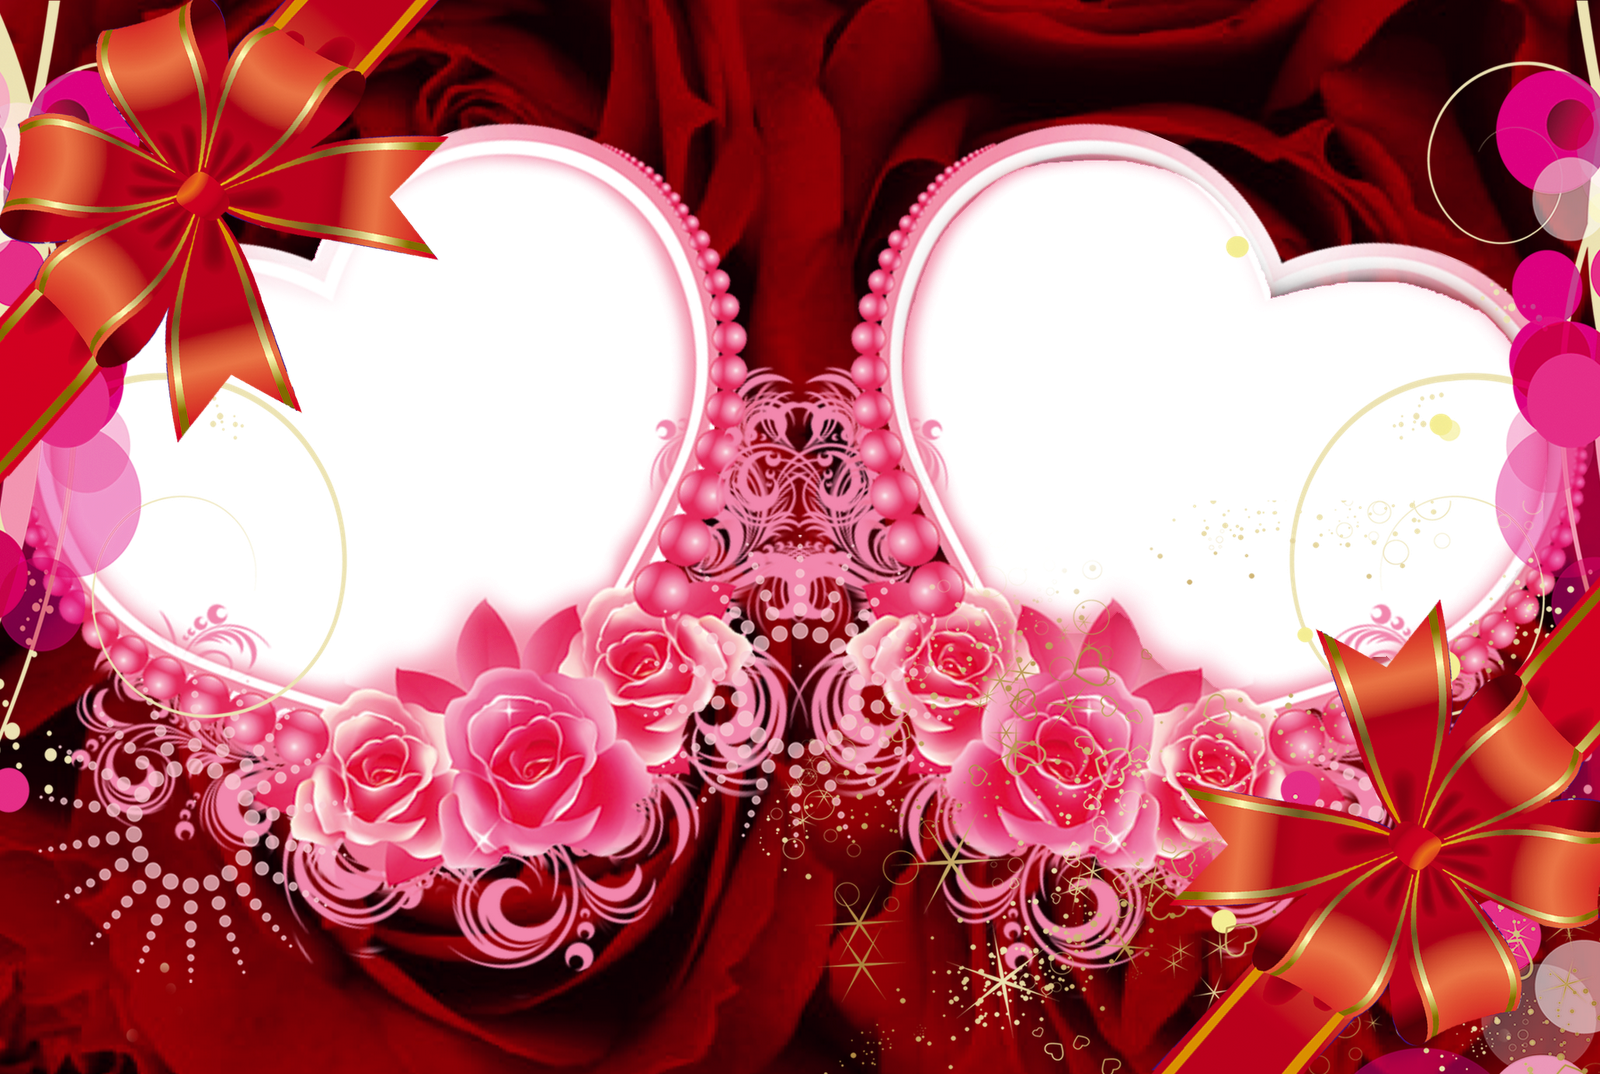 اطارات على شكل قلوب للتصميم Wedding Shoe Crown Jewelry Jewelry